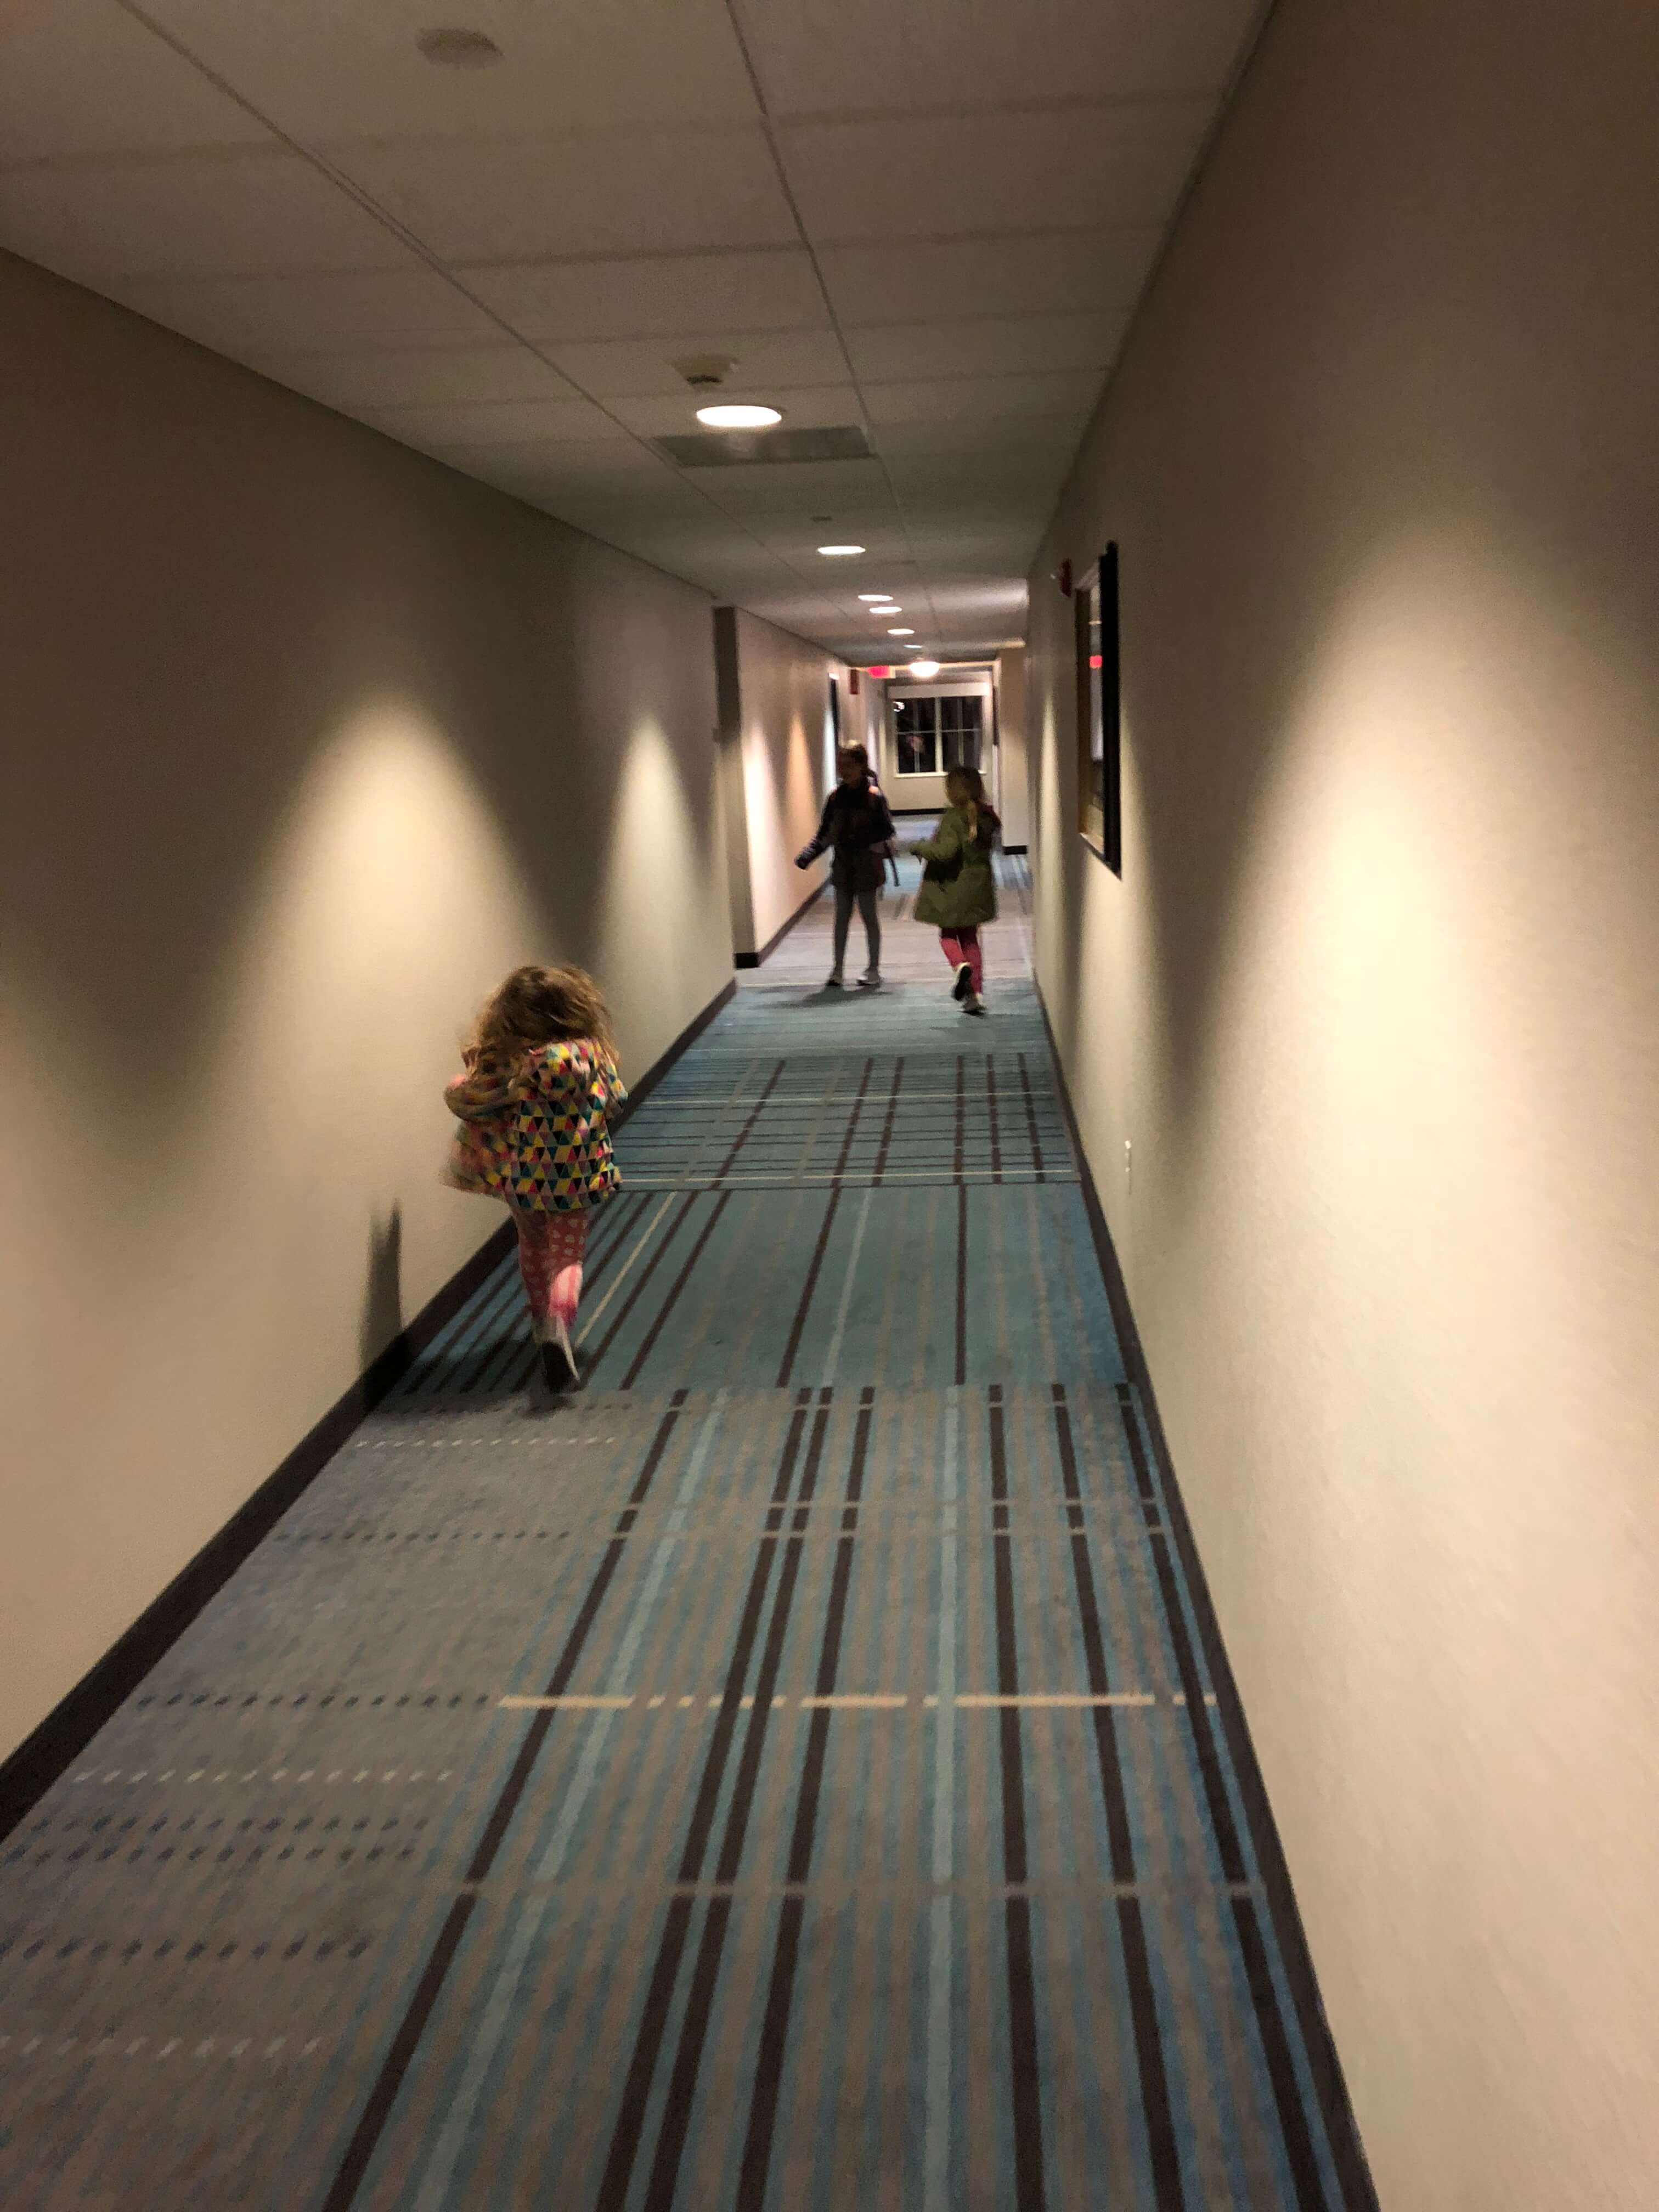 hallway run Luxurious Suites for Families at Hyatt House Fishkill/Poughkeepsie